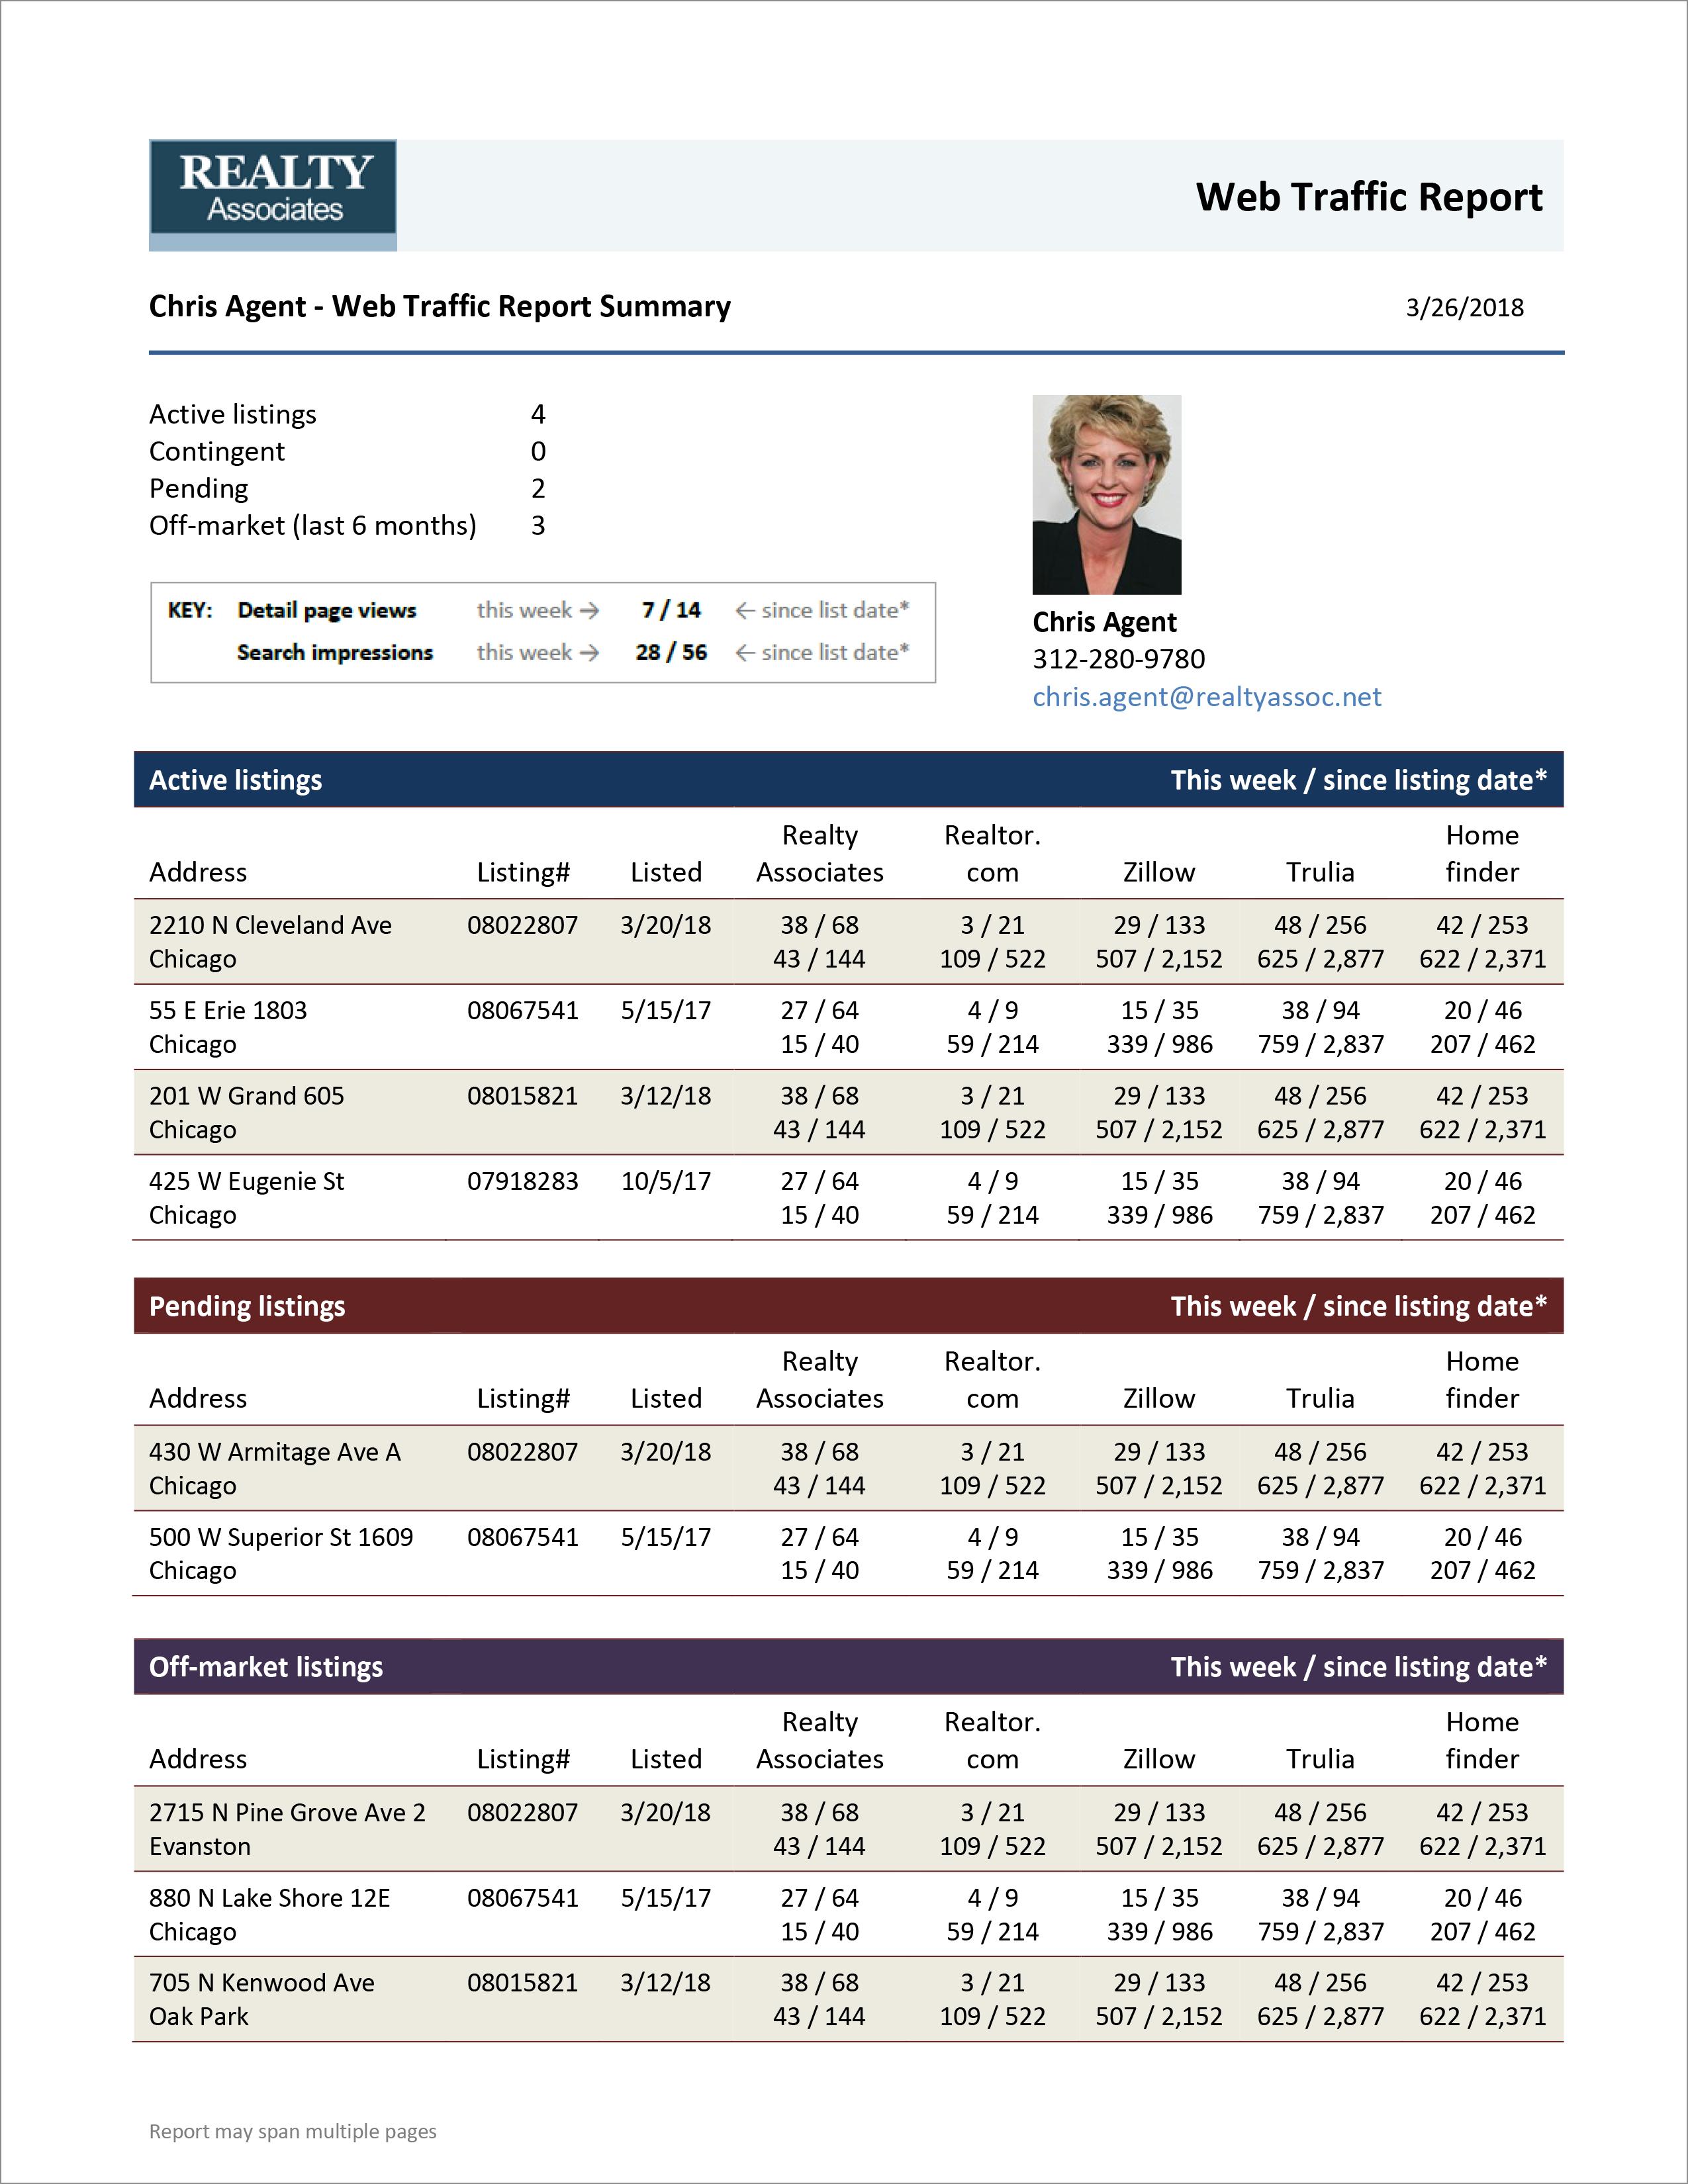 Real estate listing syndication   Trulia, Zillow, Realtor com